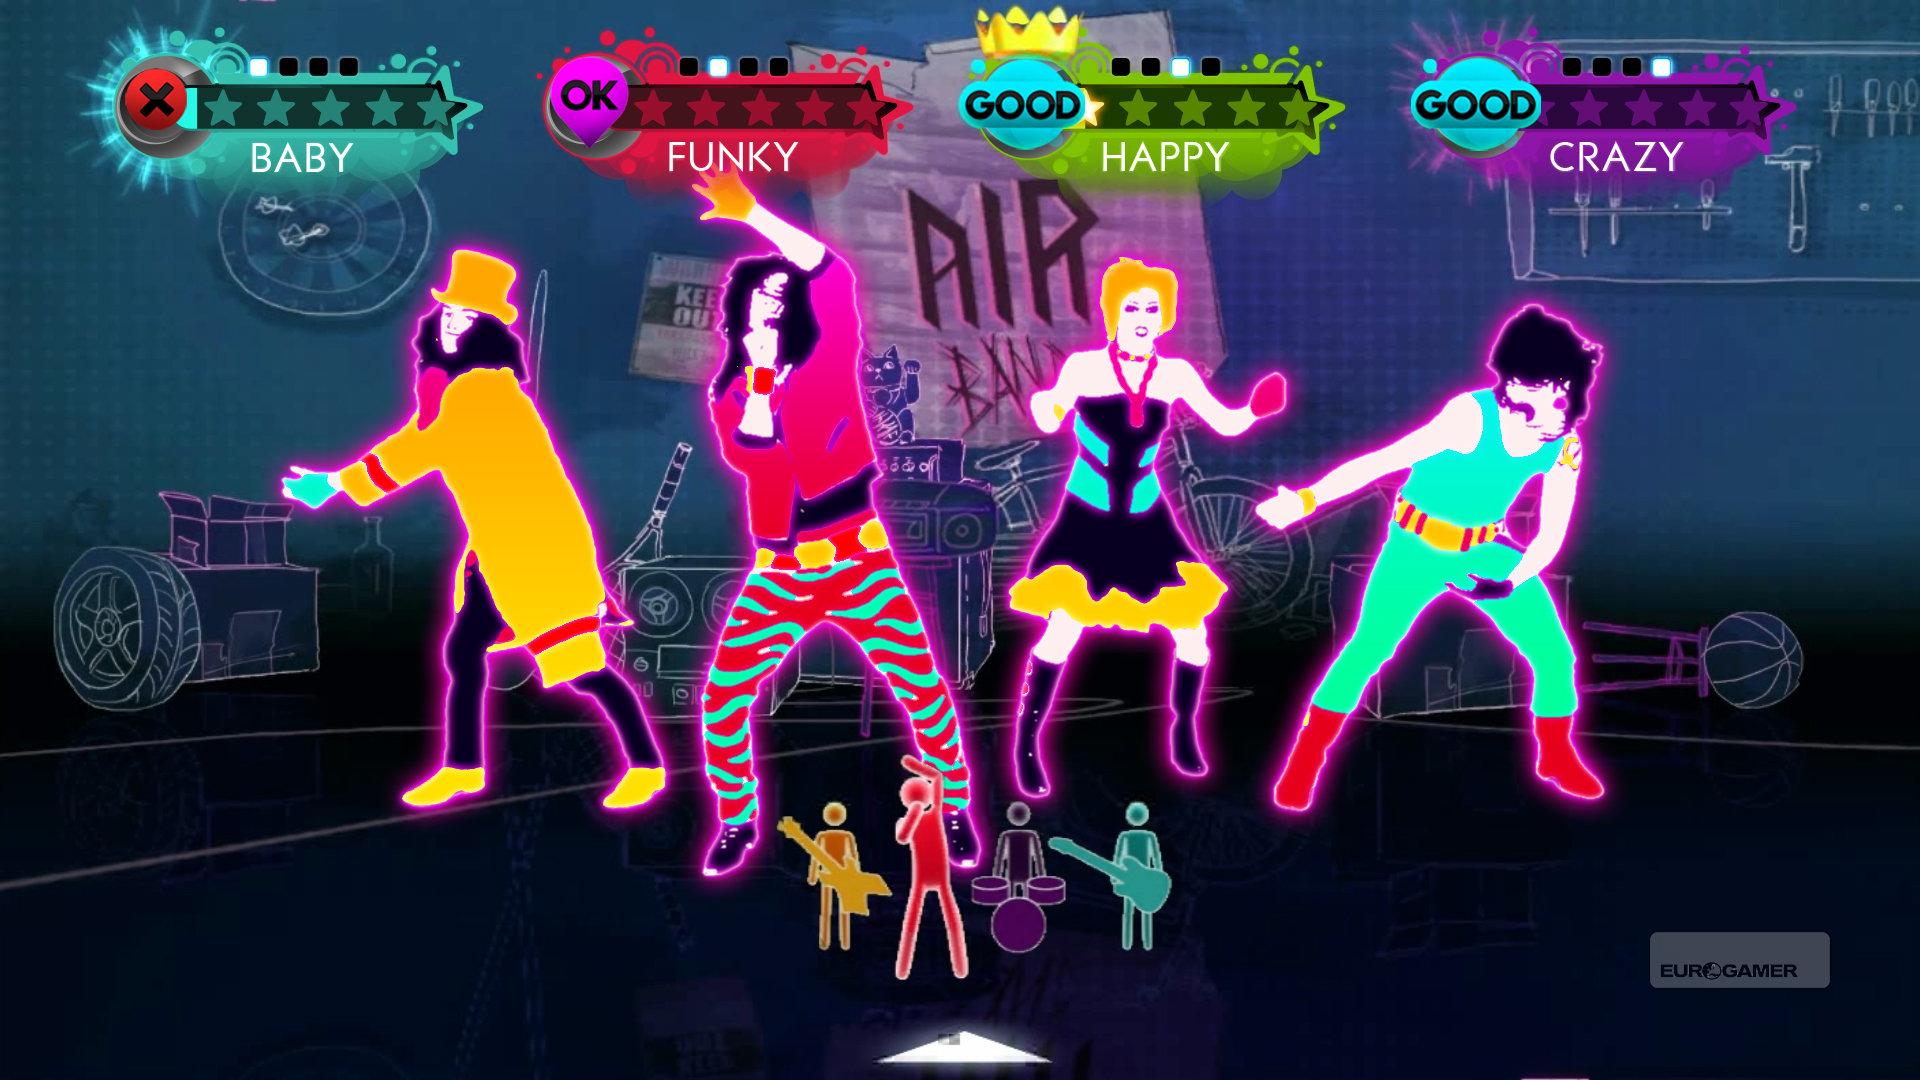 Just Dance 3 desktop wallpaper 7 of 12 Video Game Wallpaperscom 1920x1080